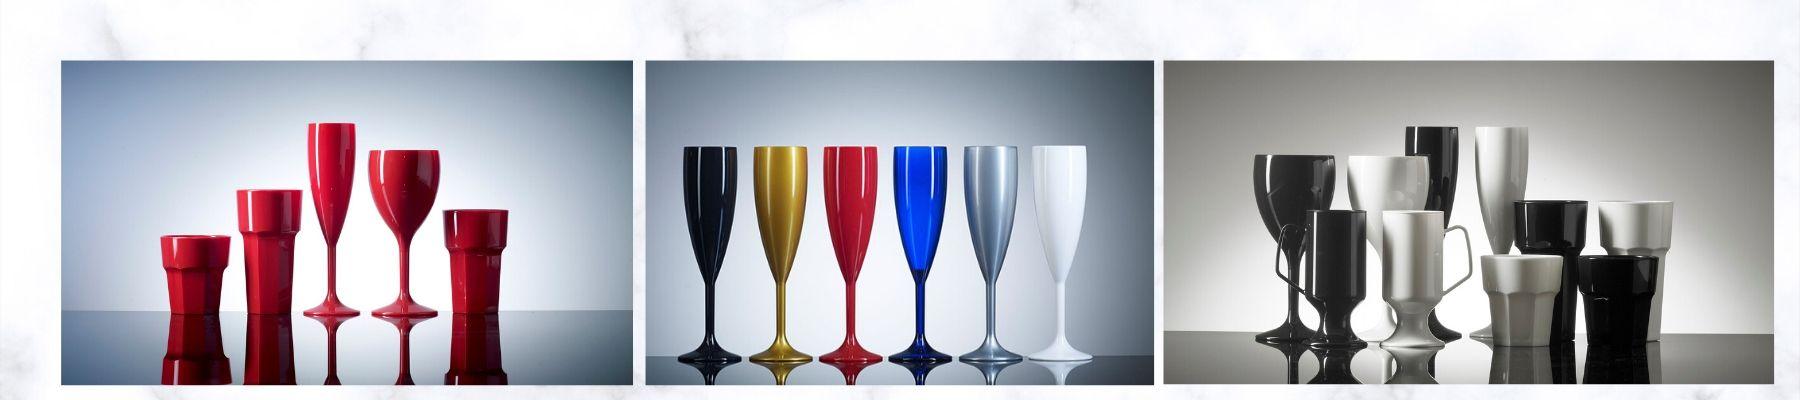 Coloured Plastic Glasses